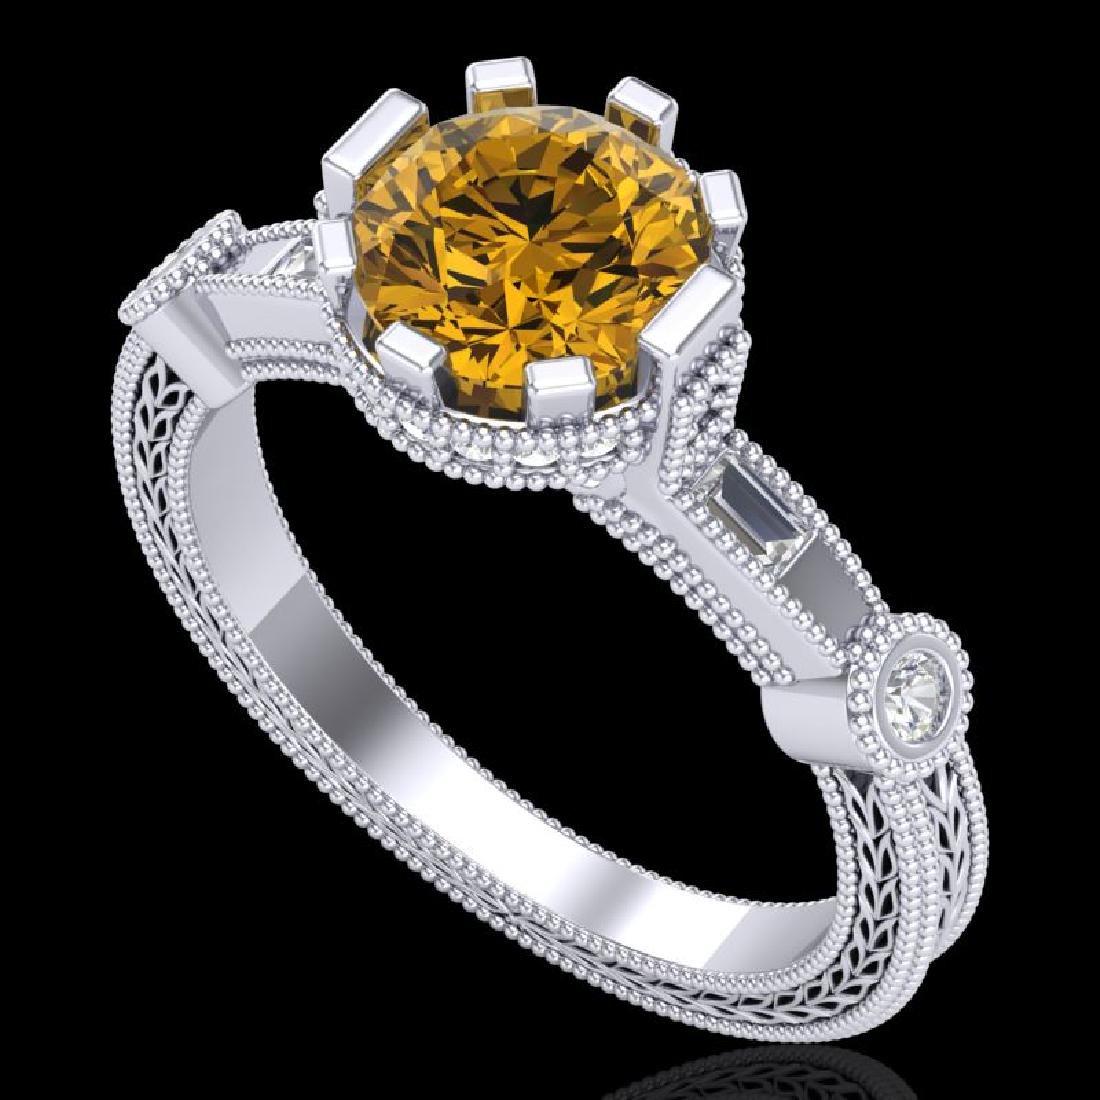 1.71 CTW Intense Fancy Yellow Diamond Engagement Art